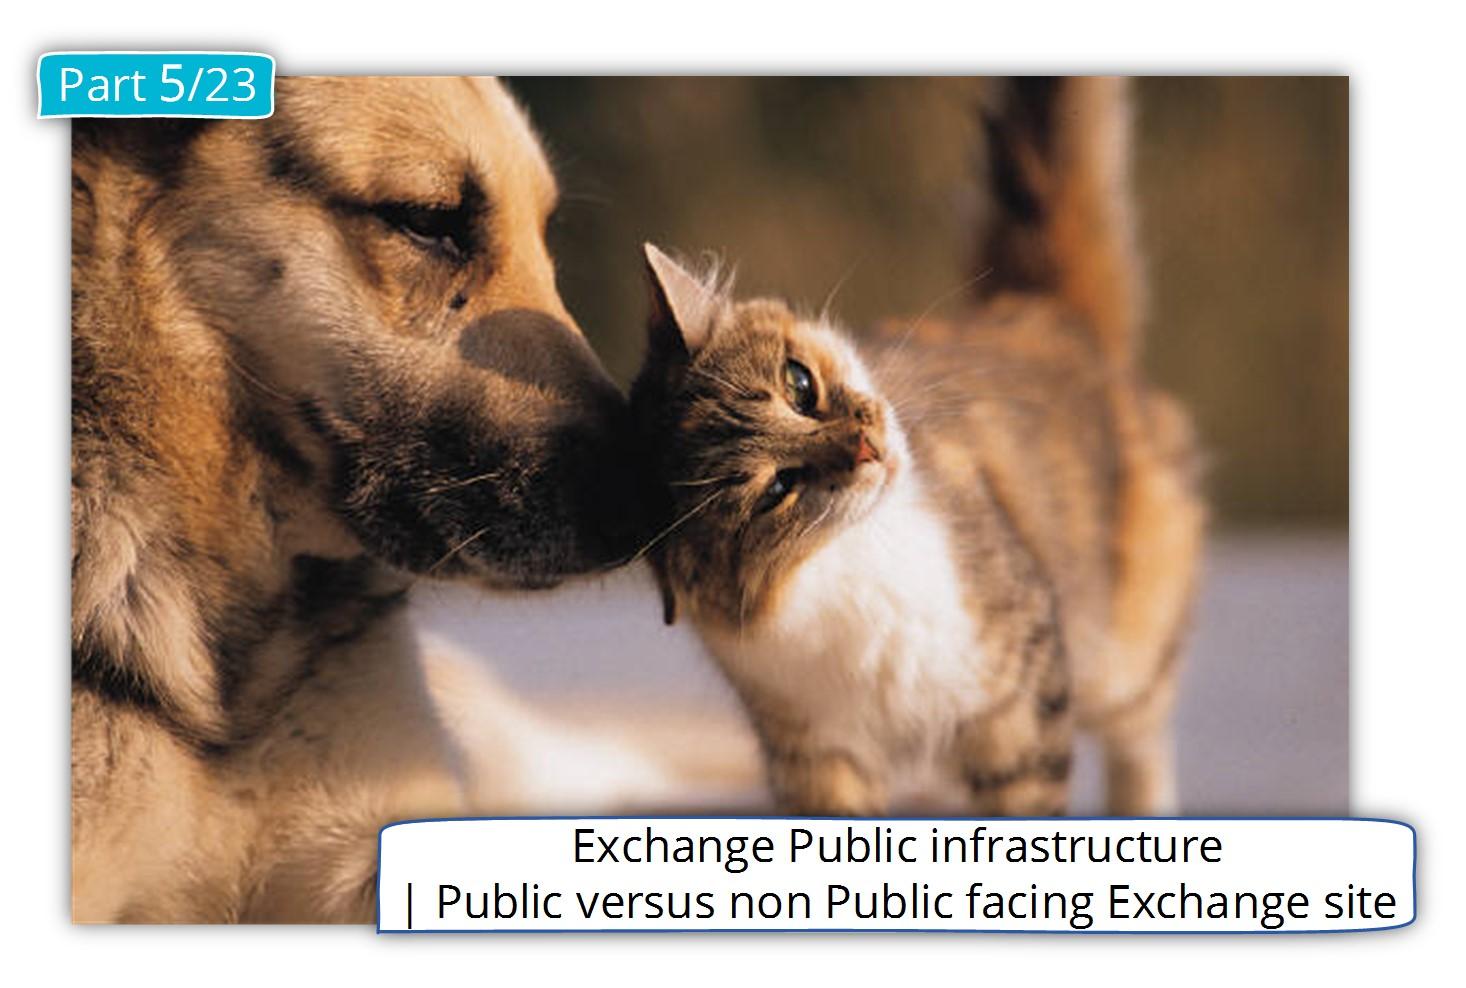 Exchange Public infrastructure | Public versus non Public facing Exchange site